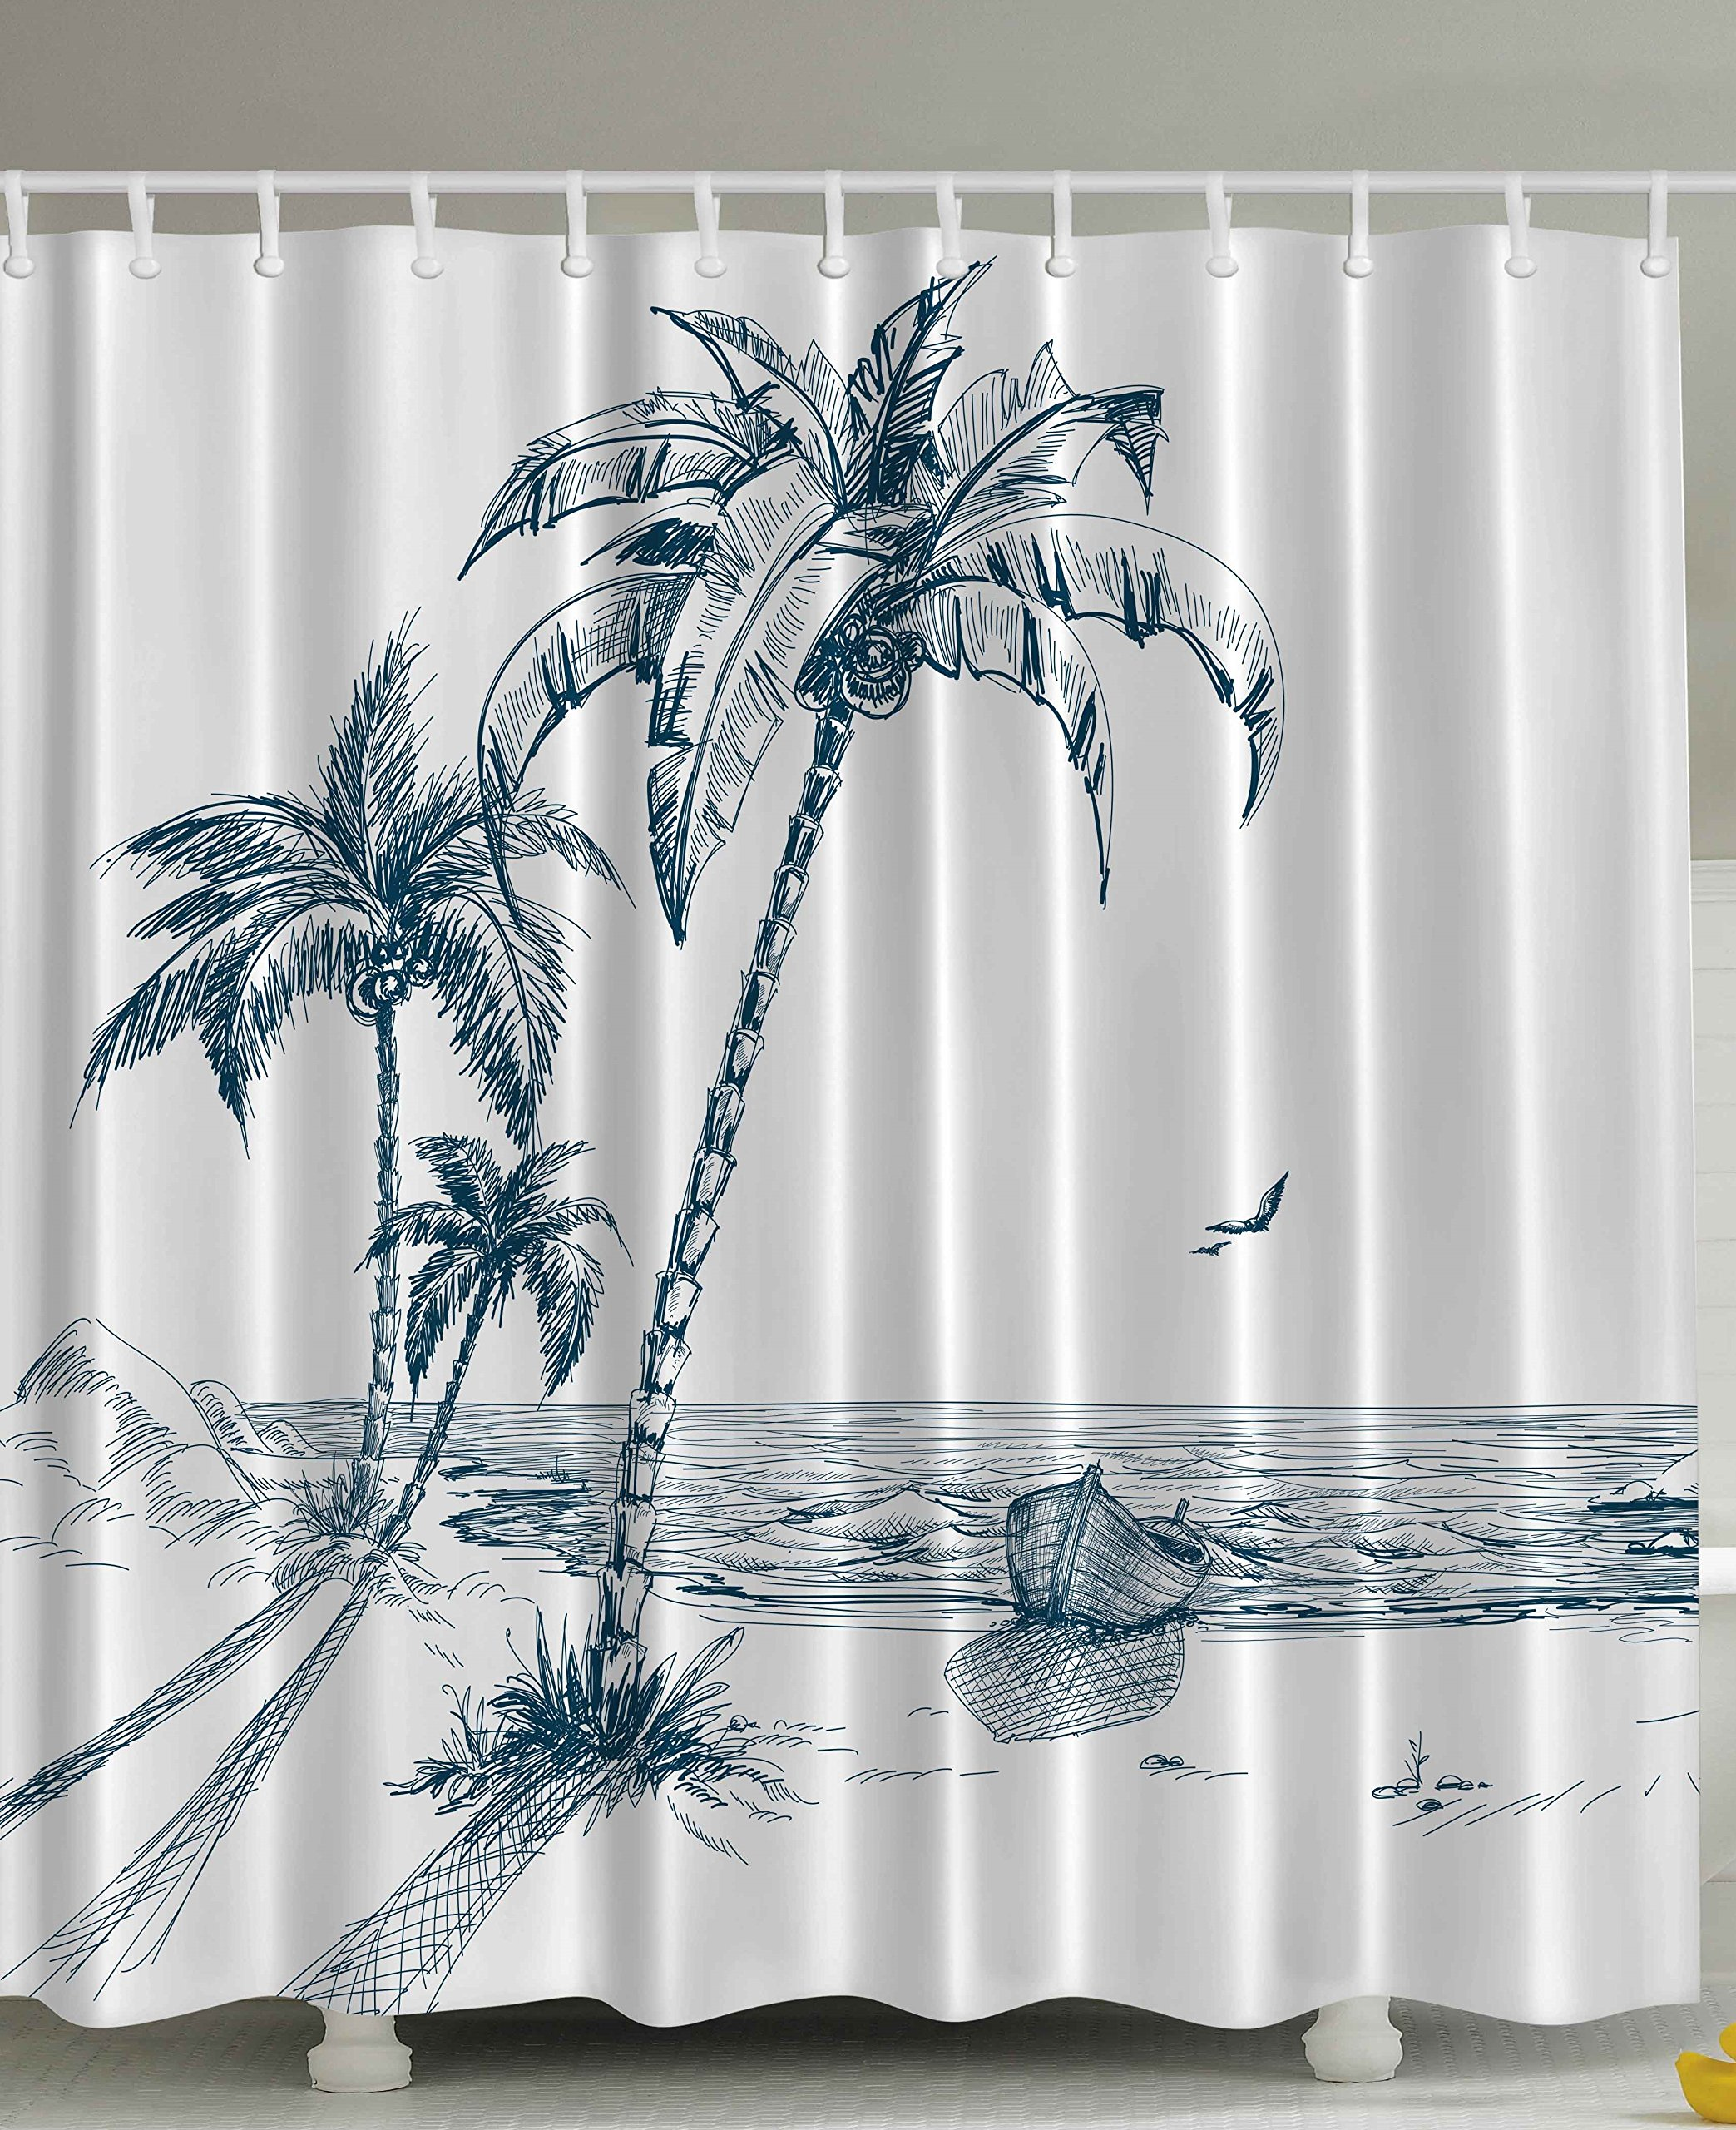 Palm Tree Shower Curtain: Amazon.com